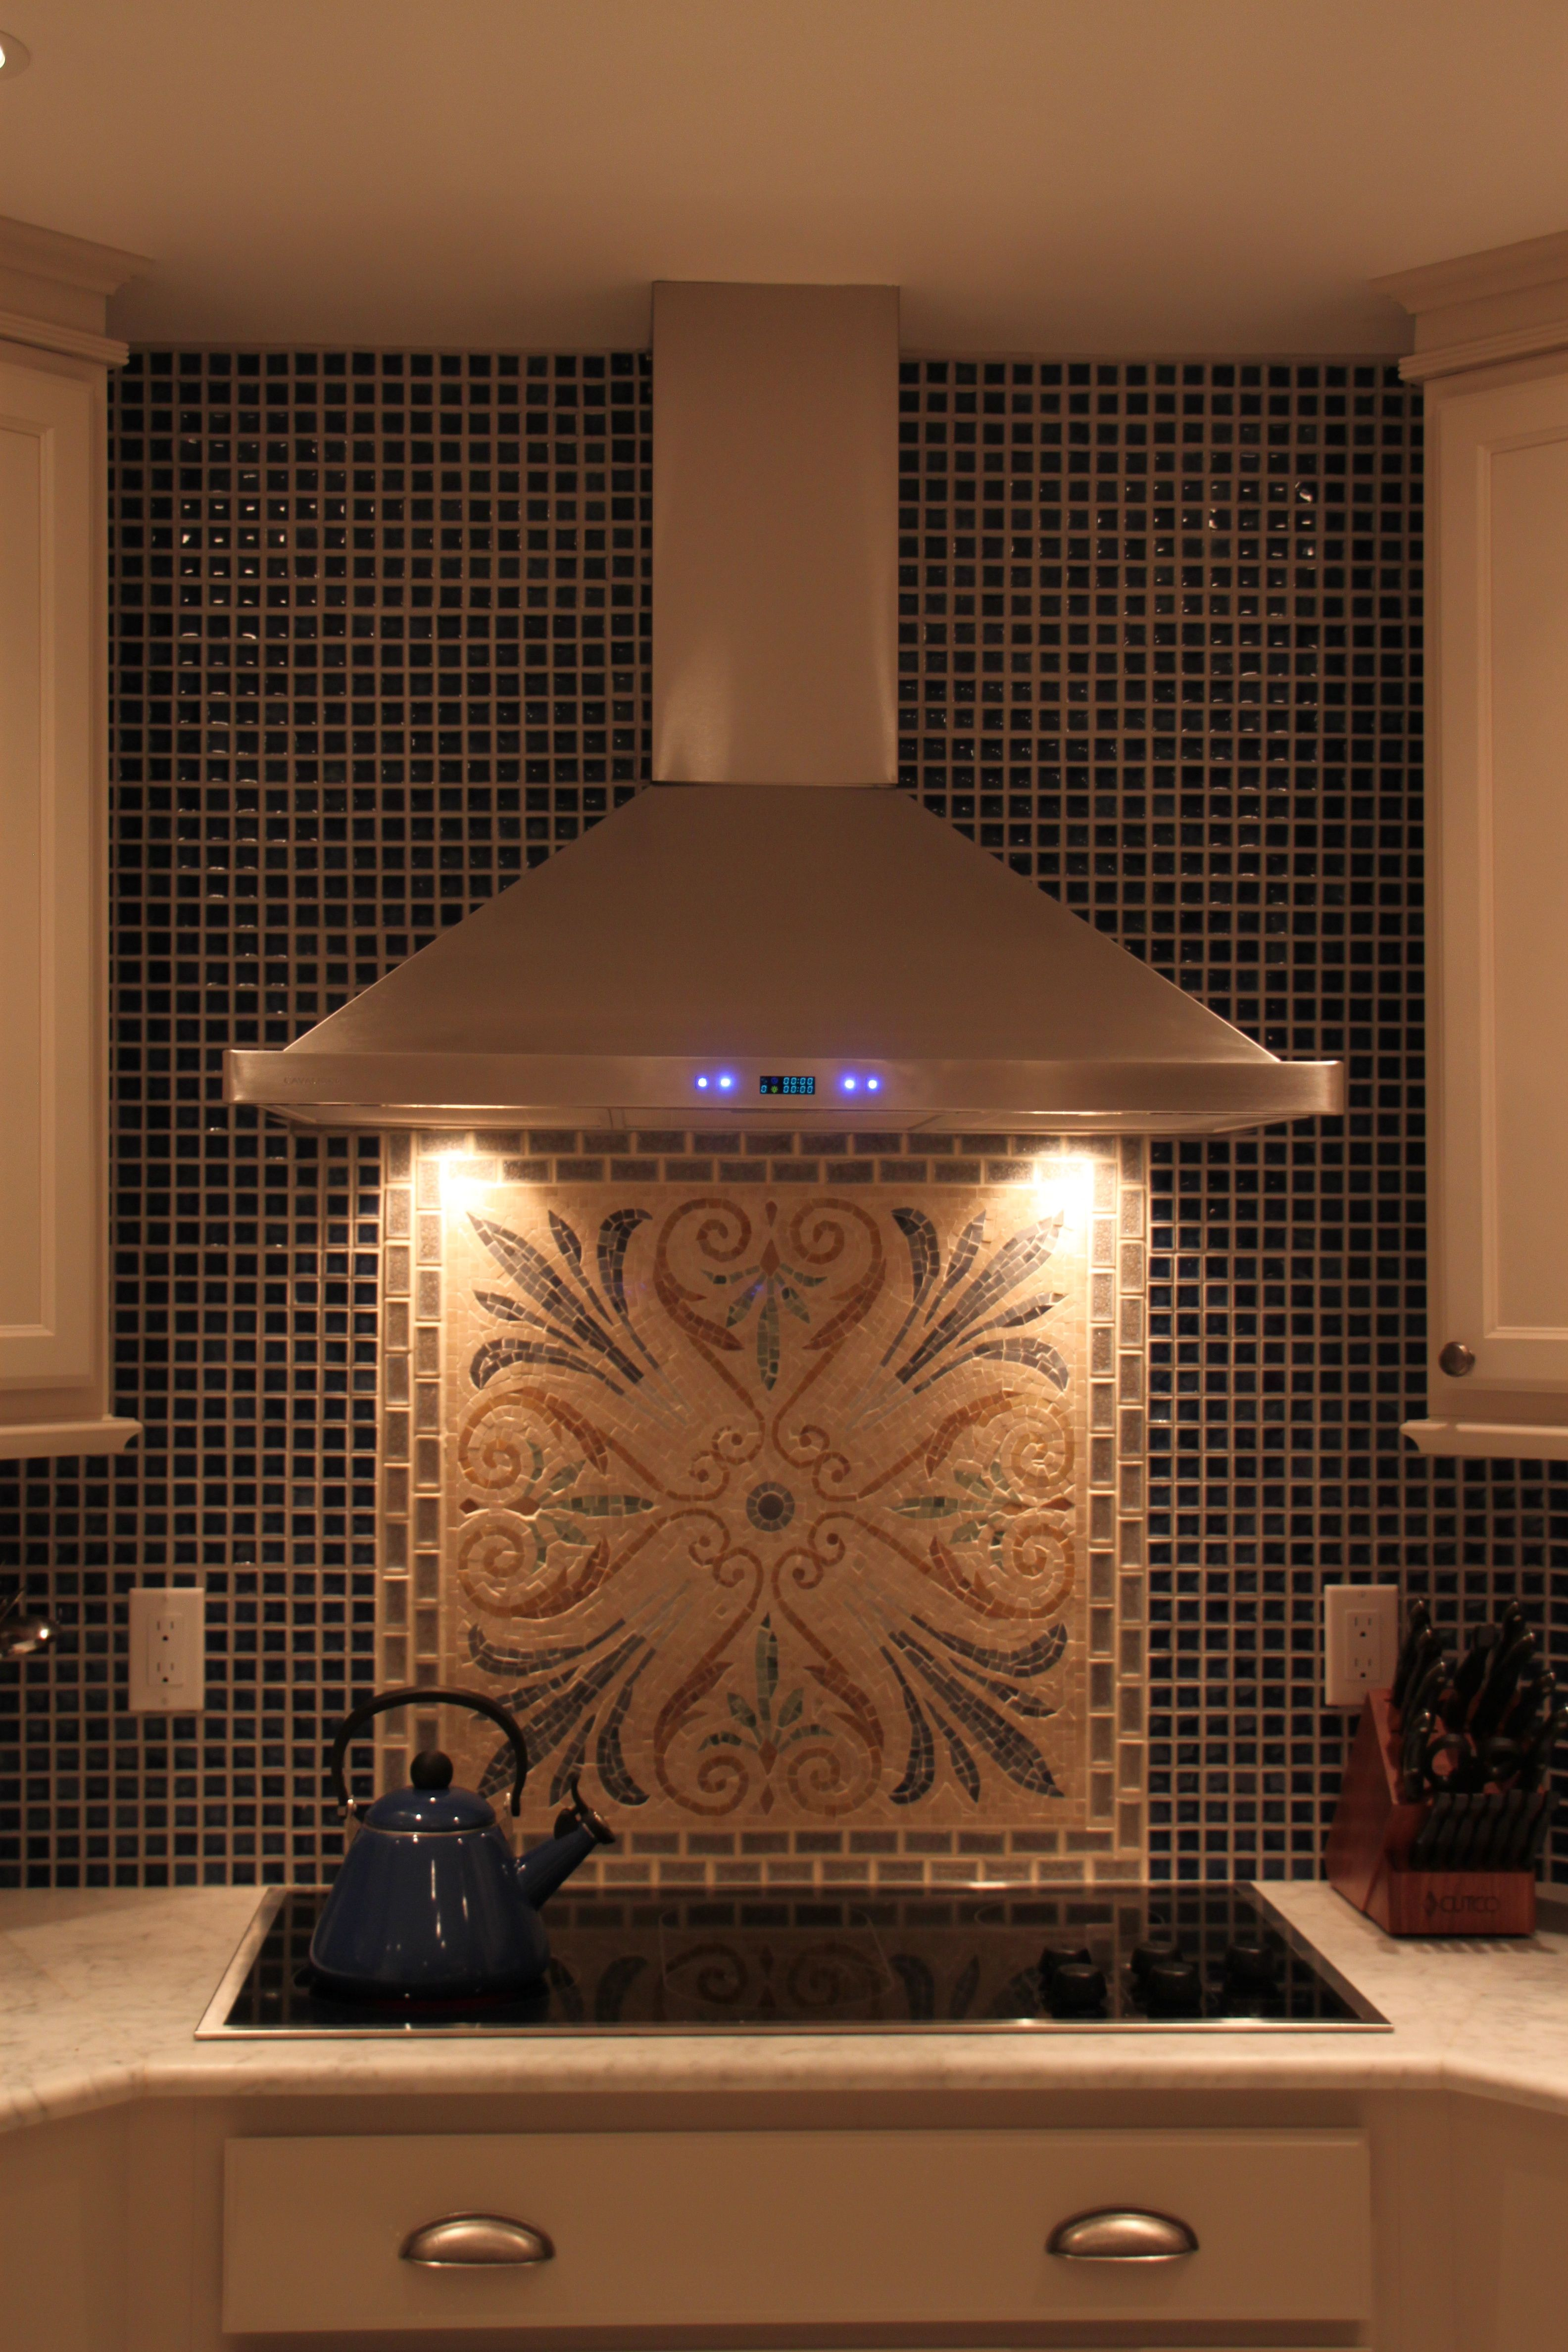 Cavaliere Hoods Kitchen Design Decor Range Hood Kitchen Range Hood